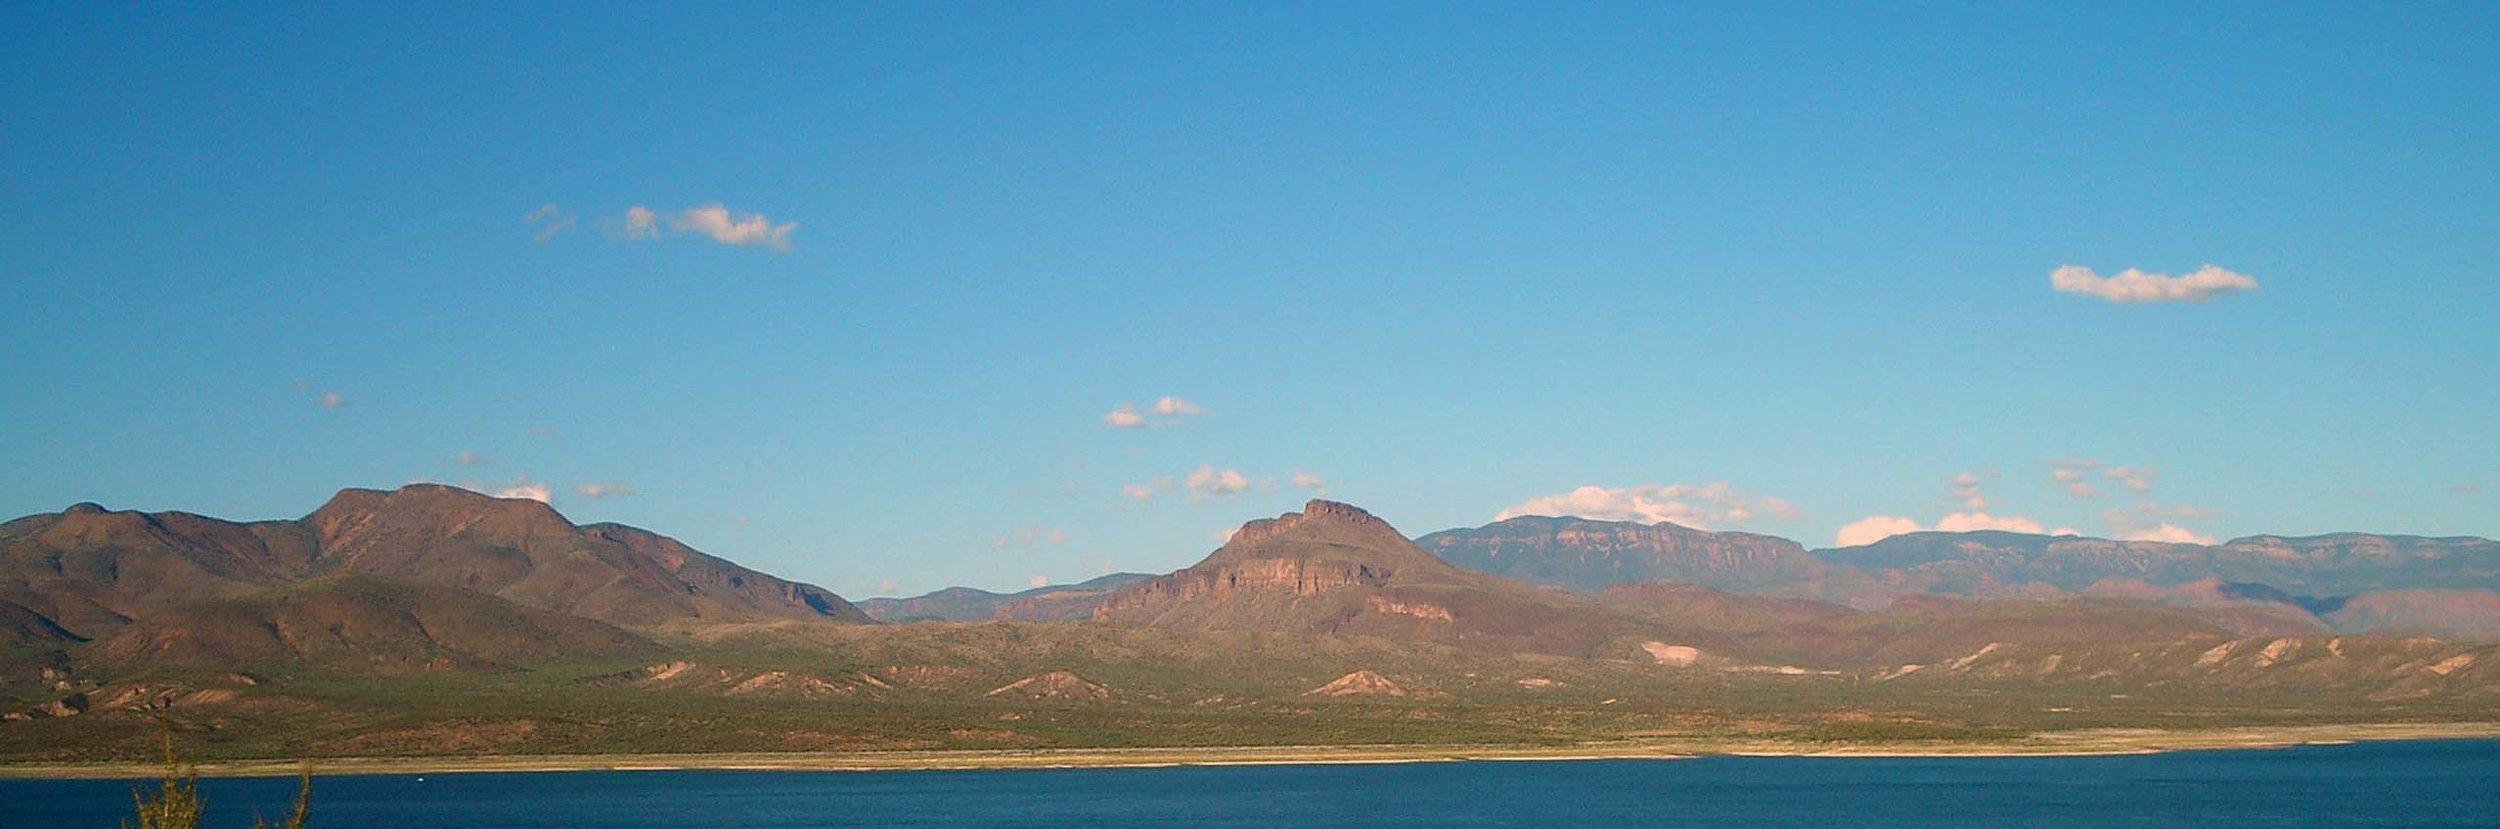 lake roosevelt arizona.jpg